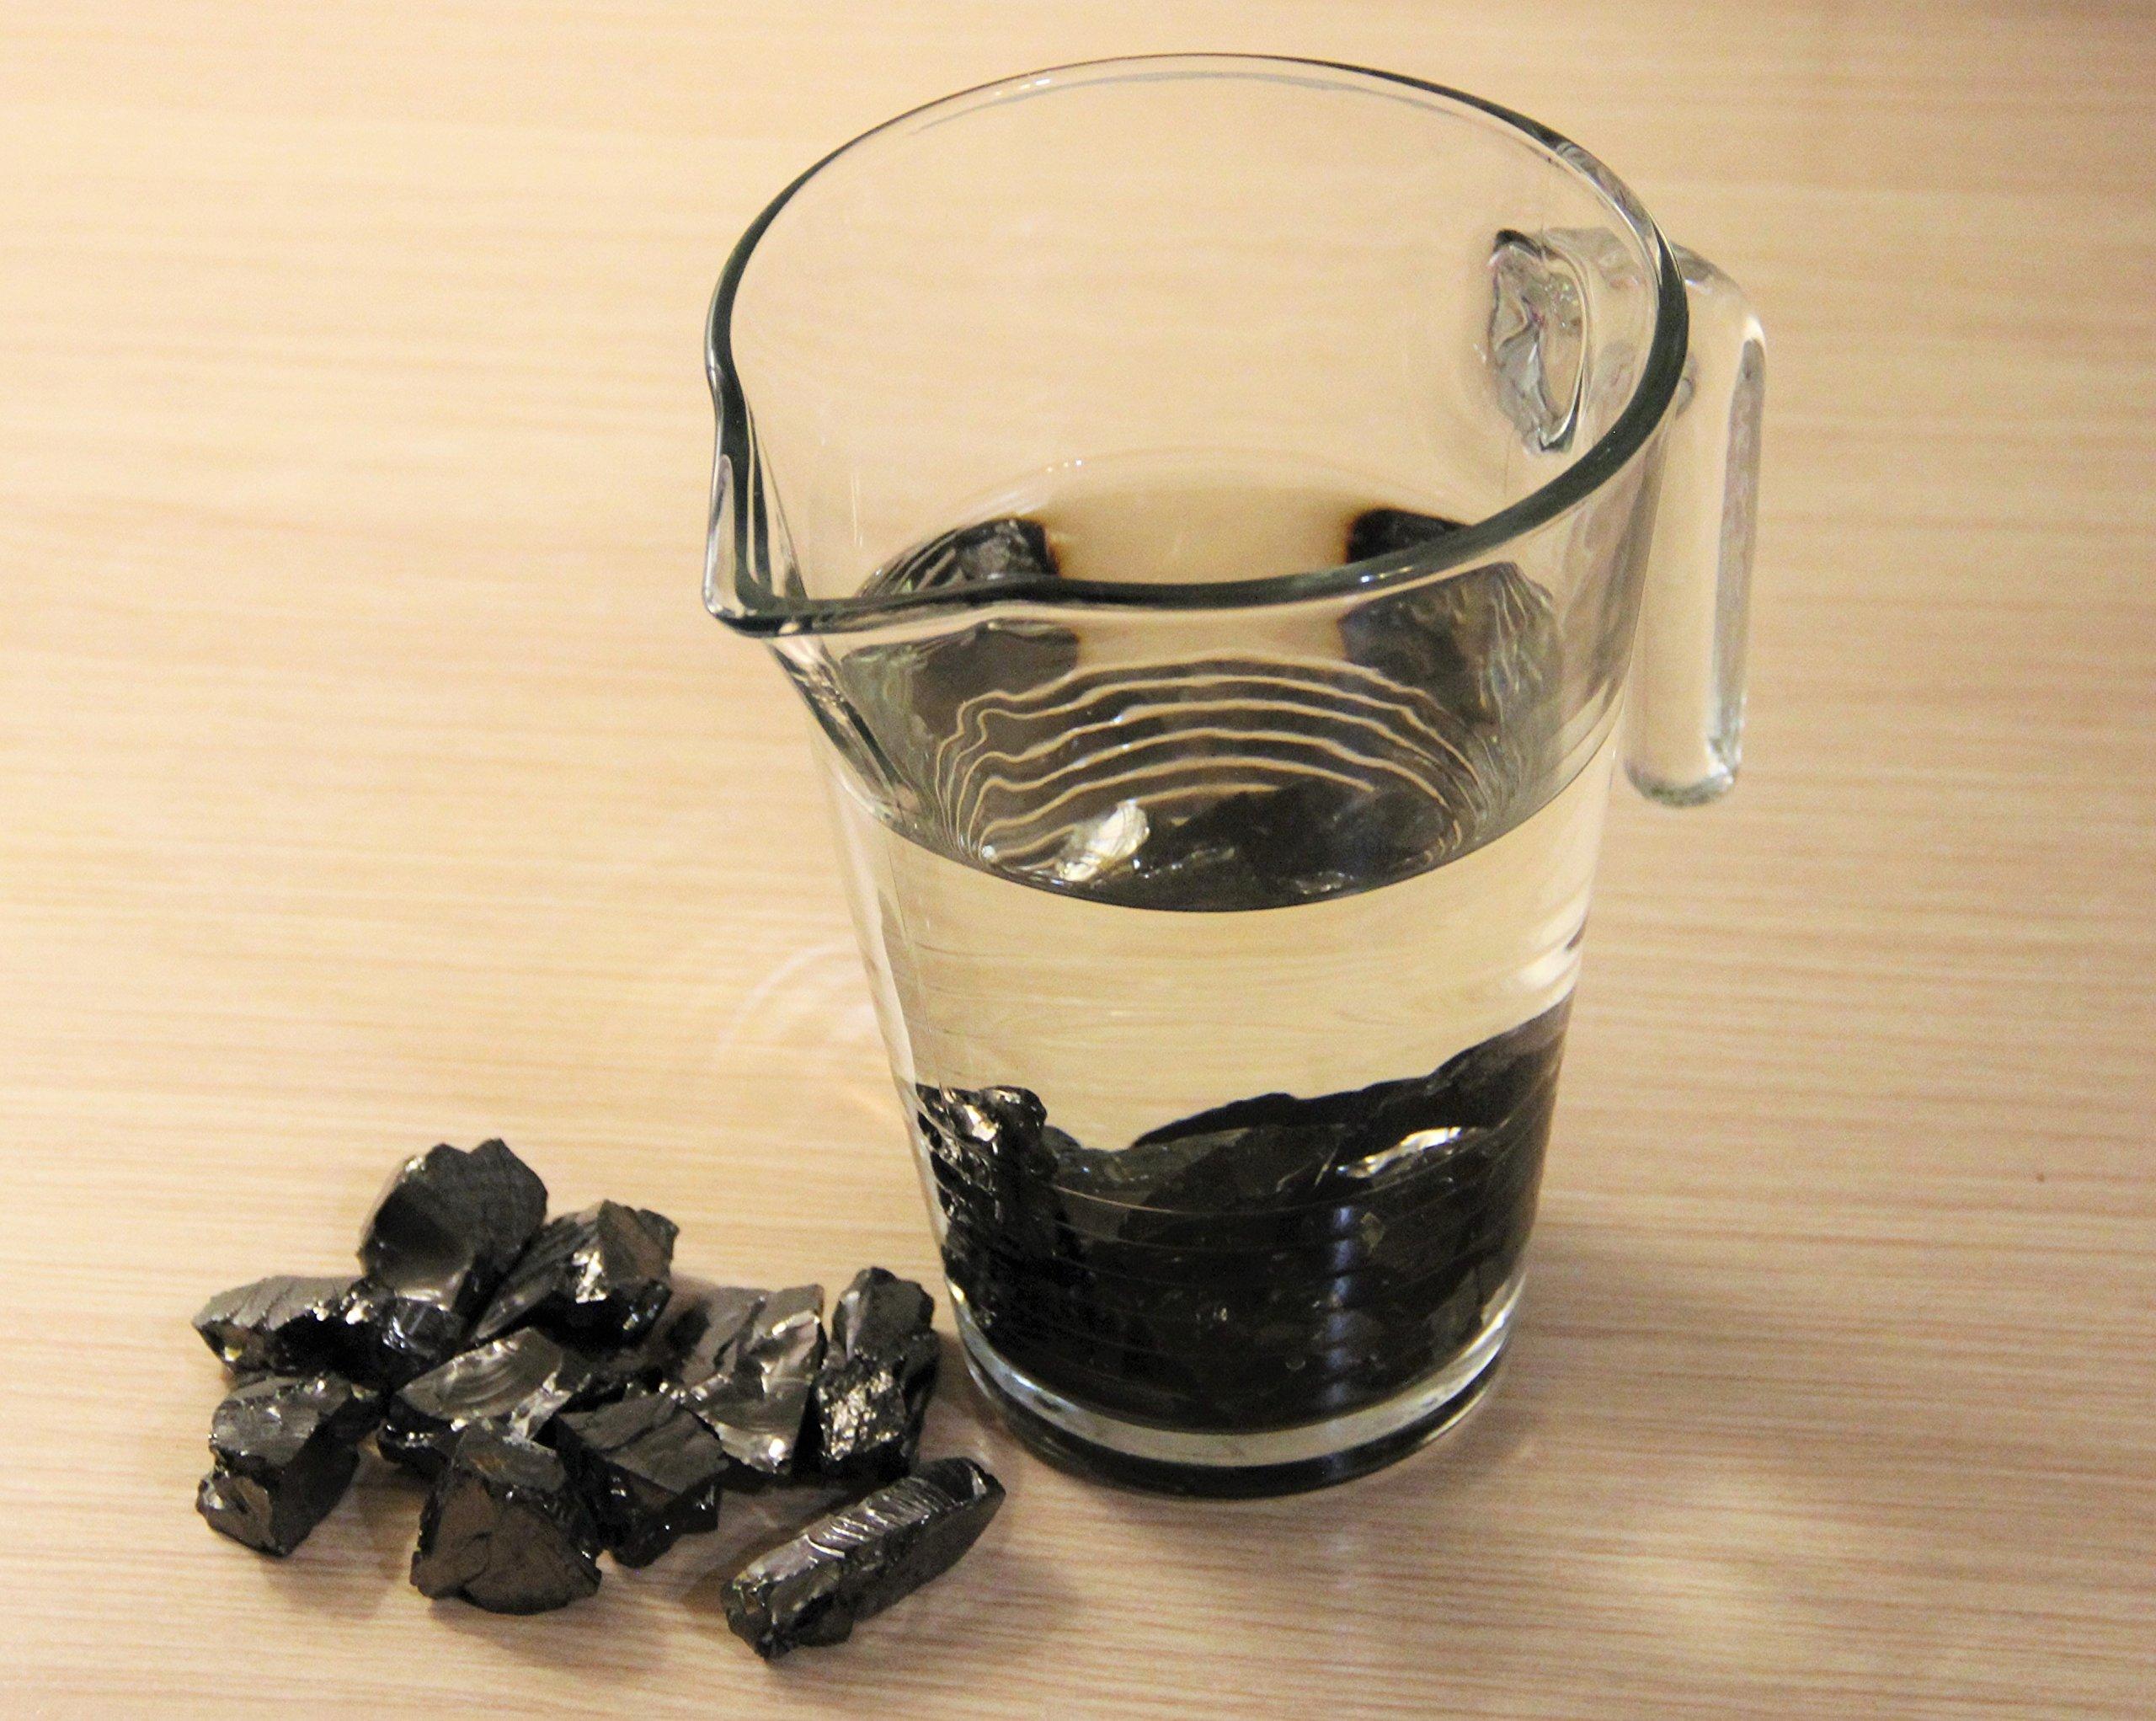 Karelian Heritage: Elite Shungite 0.1 lb (50 Grams) Water Purification Set (15-30 mm stones) ES88 by Karelian Heritage (Image #1)